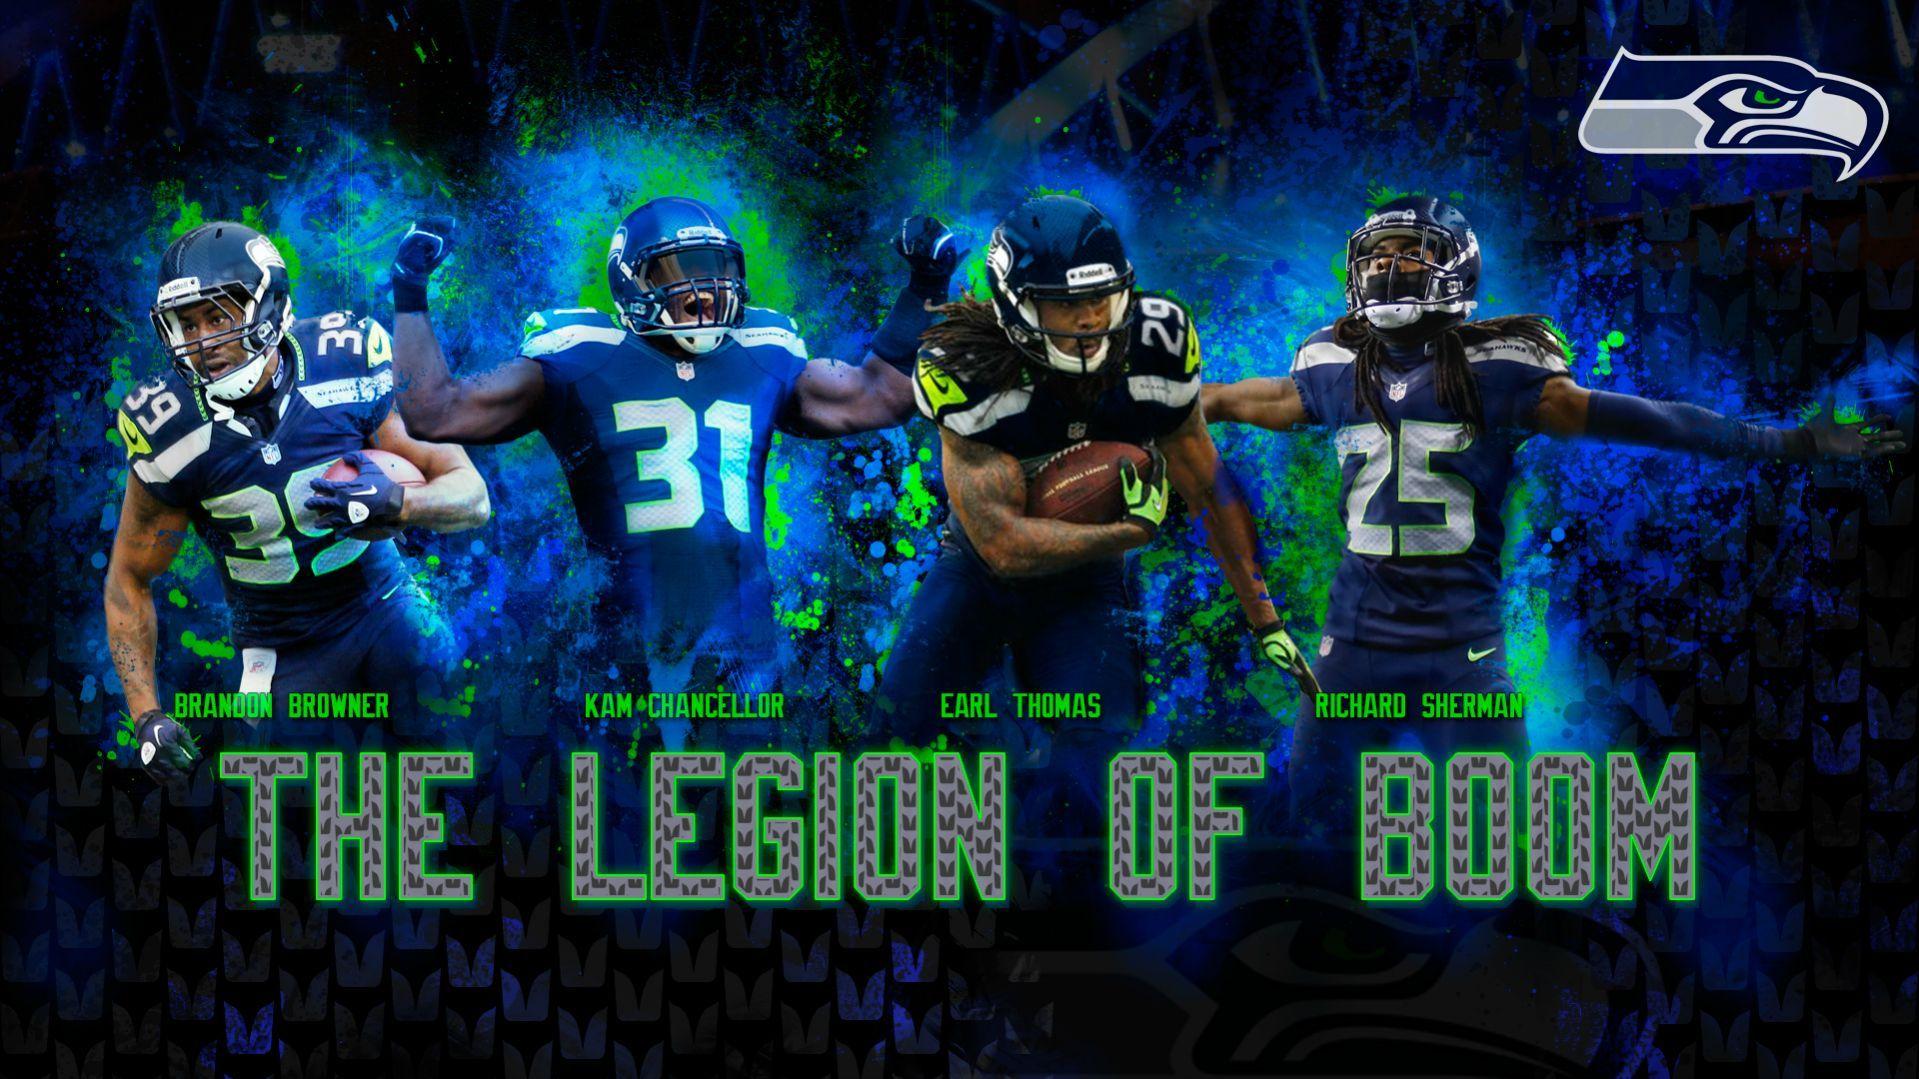 The Legion Of Boom Legion of Boom Pinterest Seahawks and